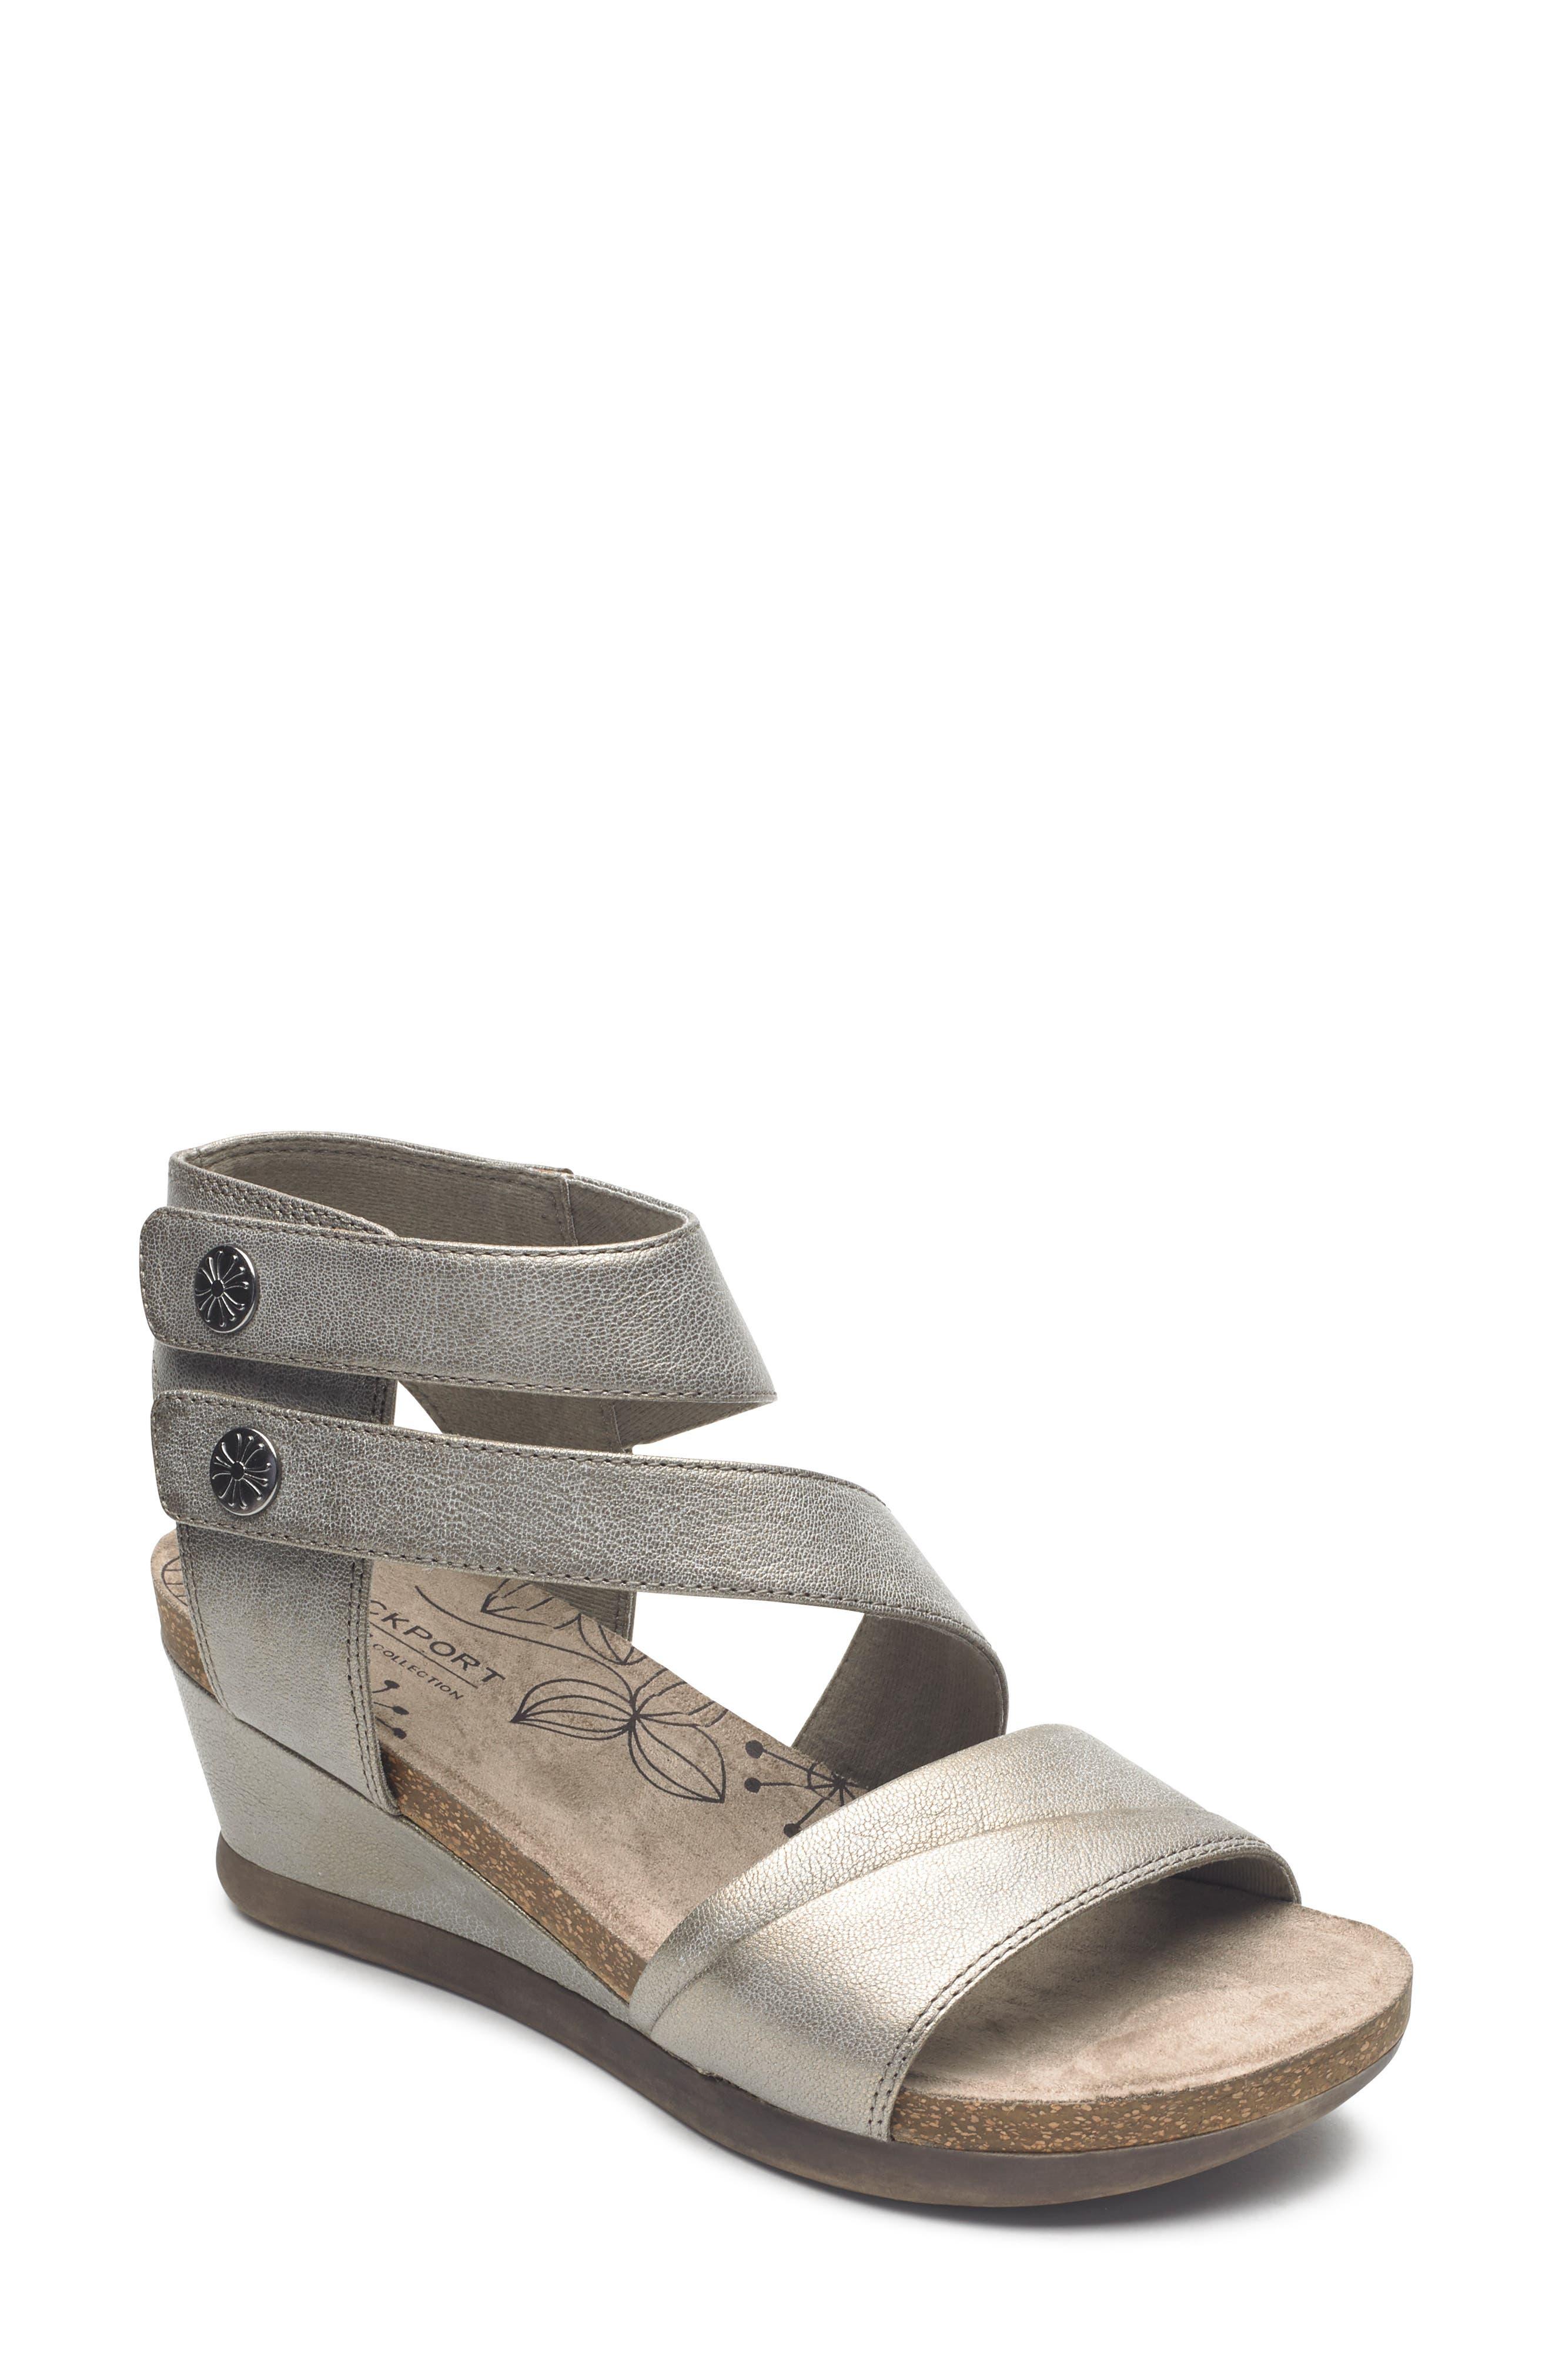 Women S Rockport Sandals